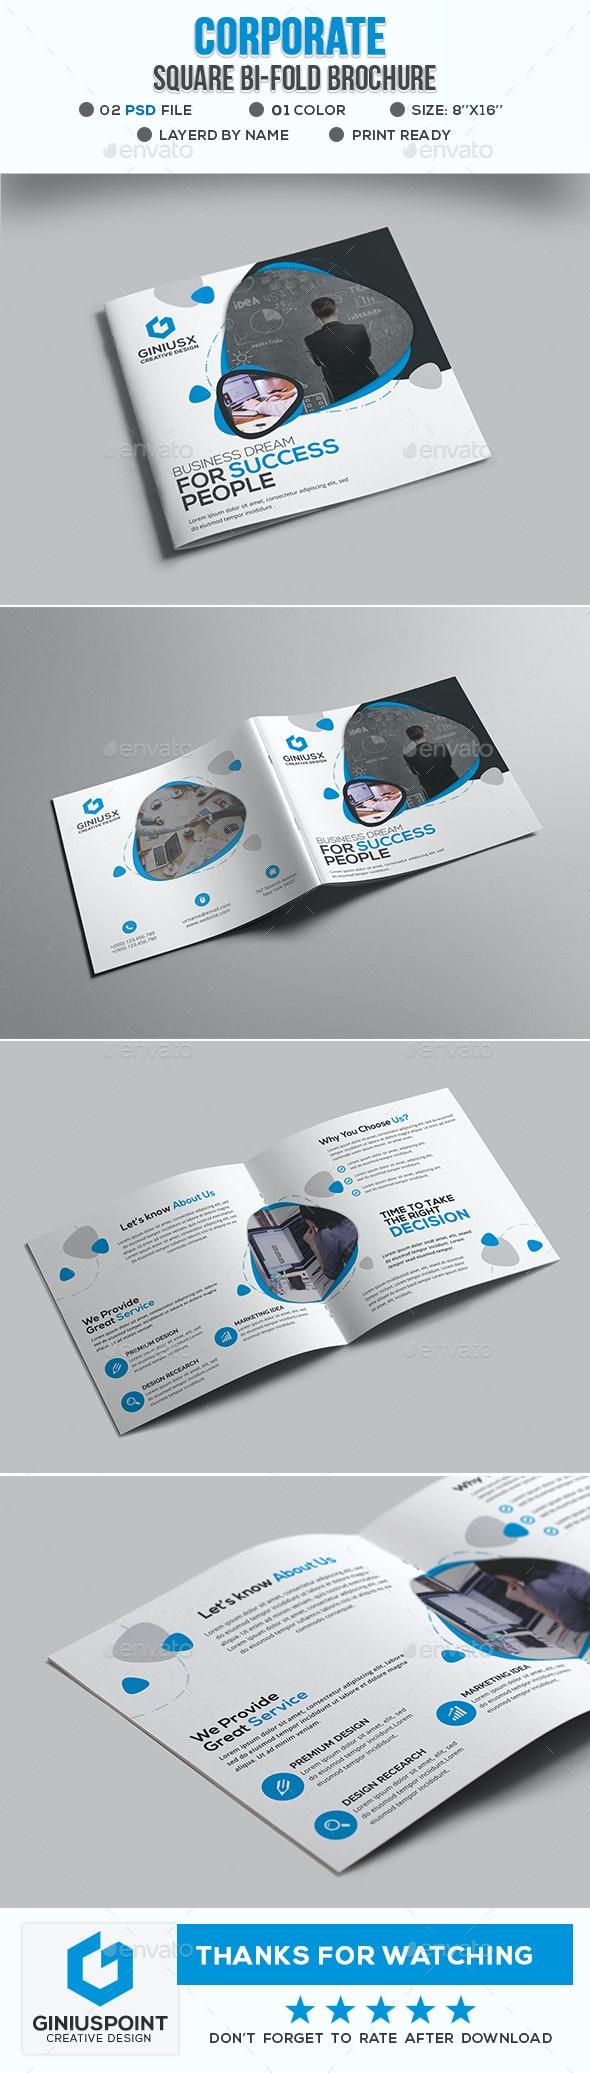 Corporate Square Bi-Fold Brochure - Brochures Print Templates